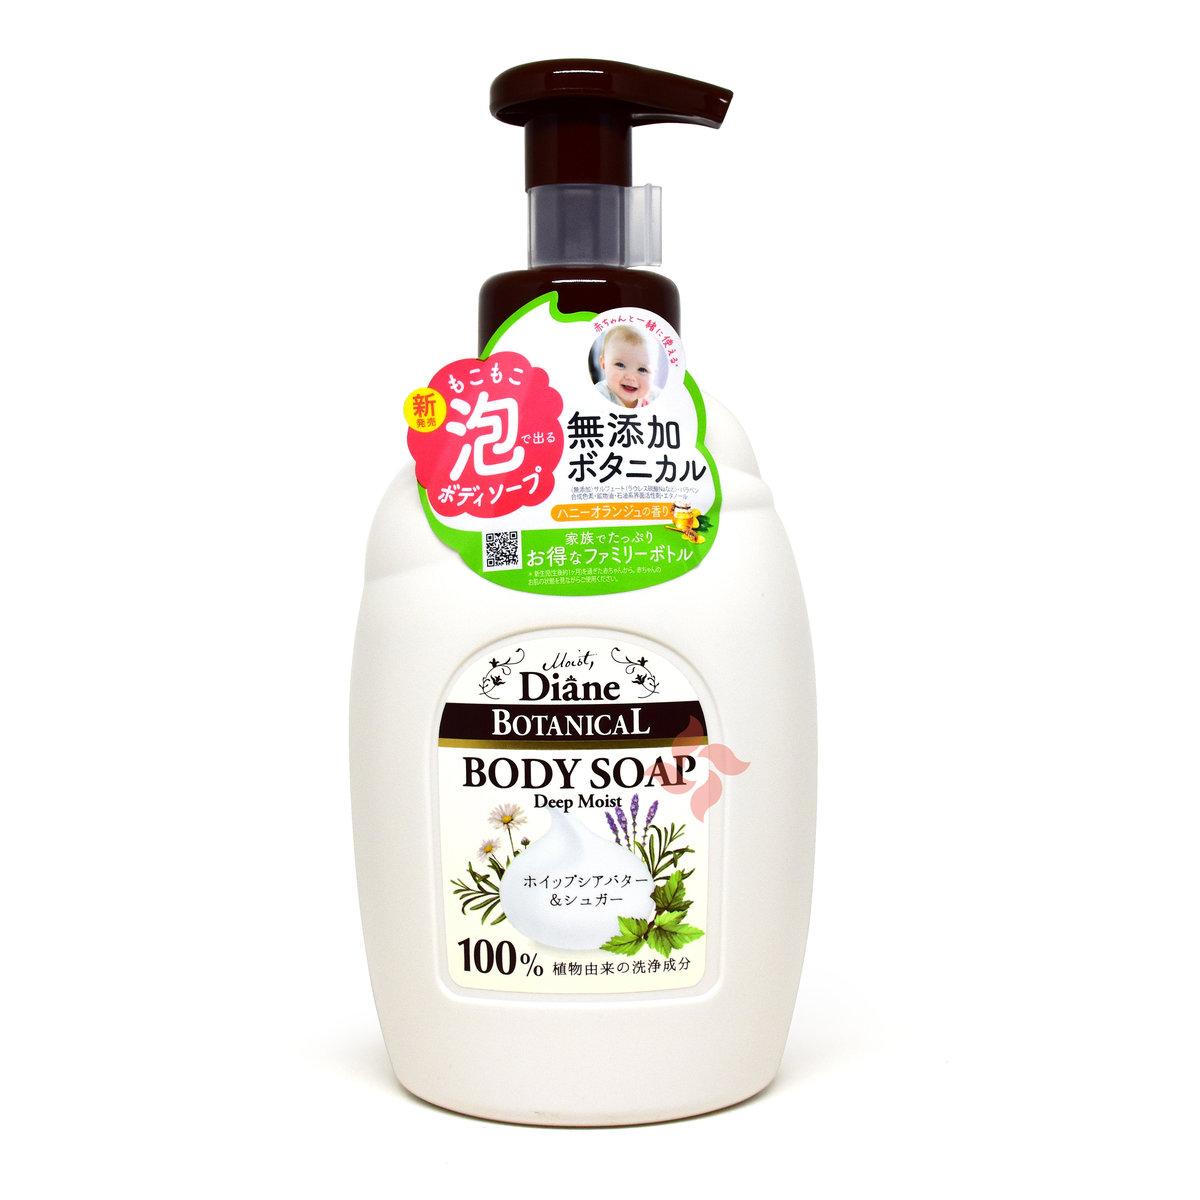 Botanical Deep Moist Body Soap 800ml (White) (4560119221513)